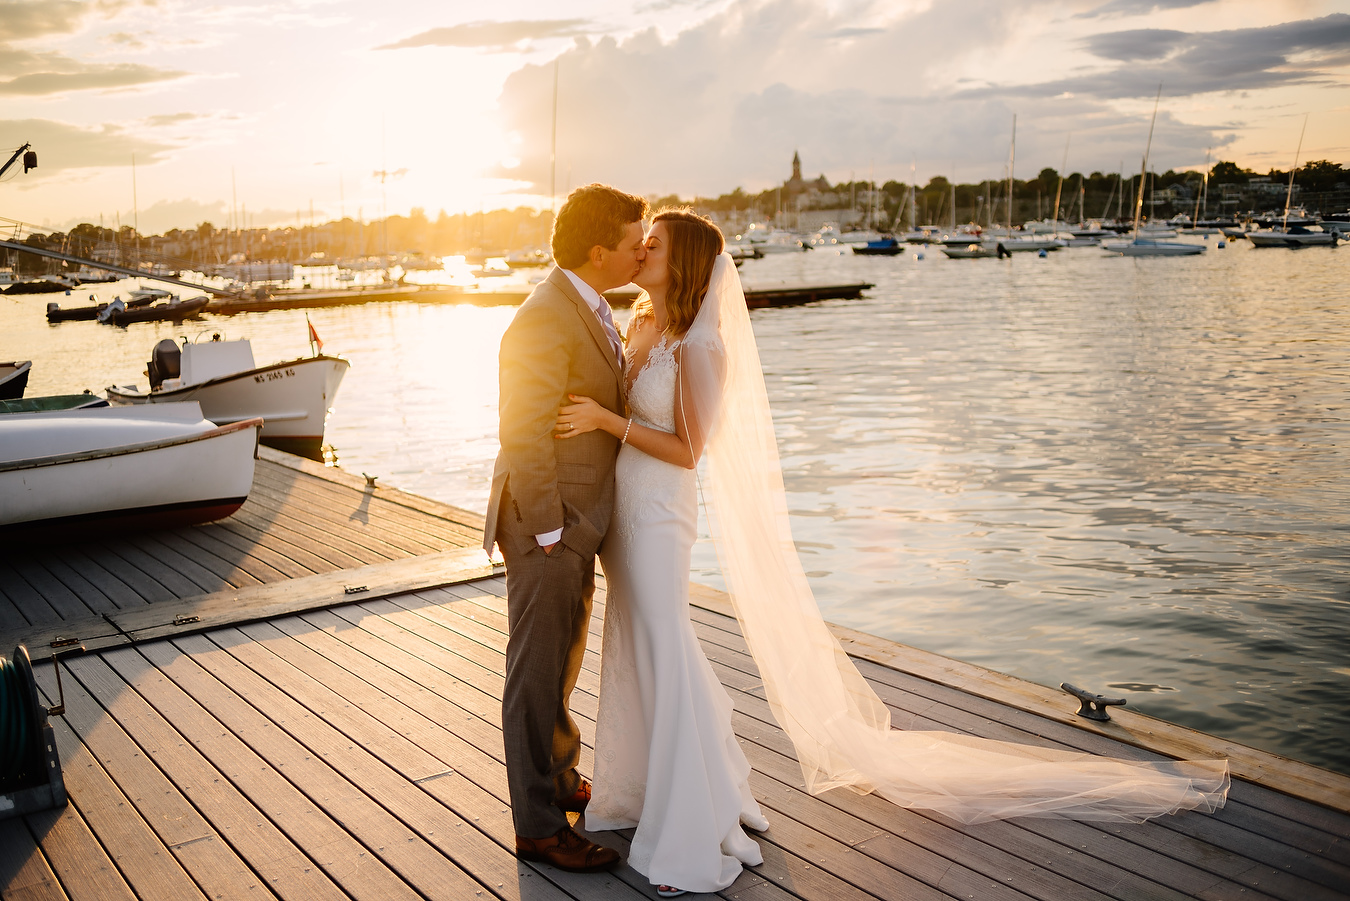 eastern_yacht_club_wedding_photos_marblehead_33.JPG